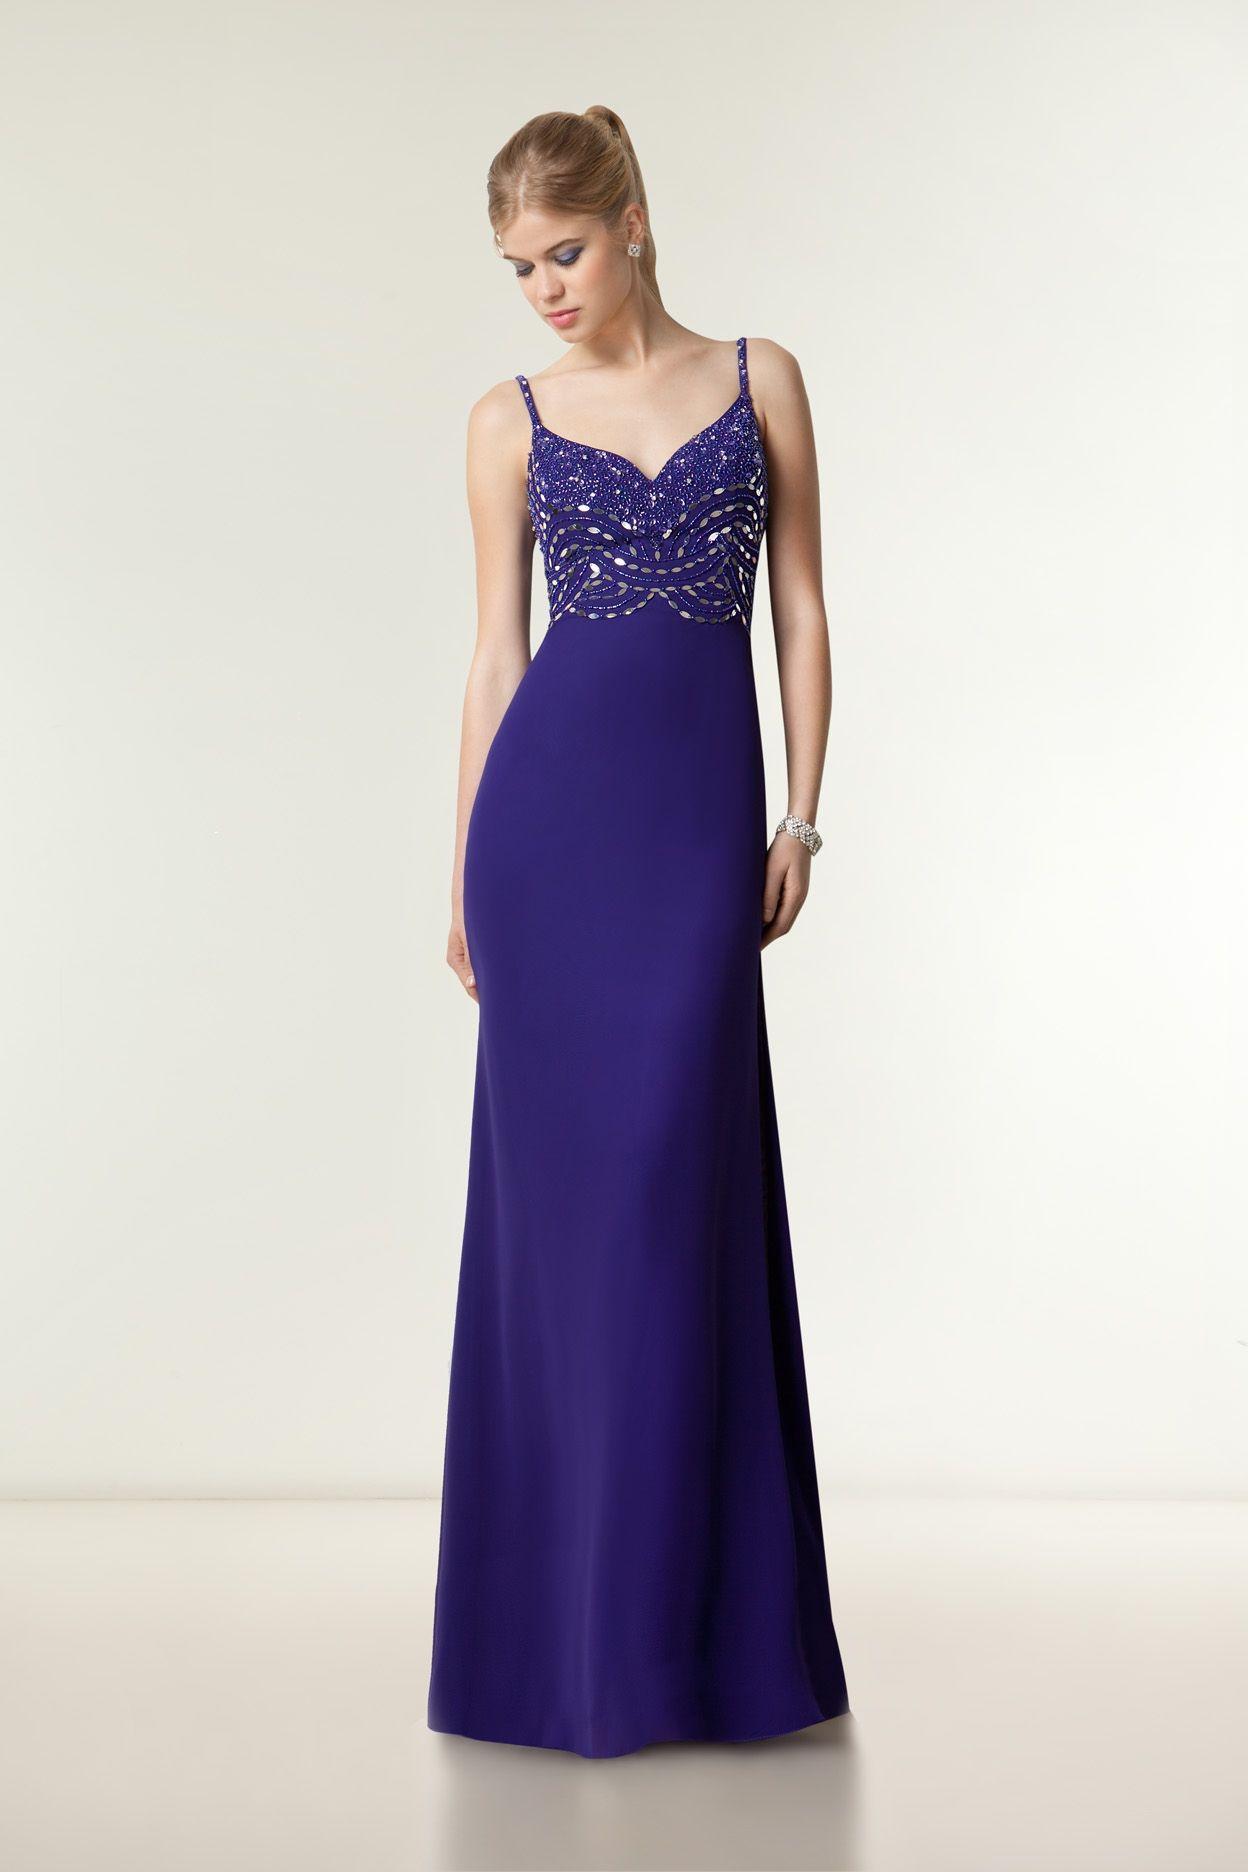 E271 - Party Dresses - Demetrios Bride - Weddingspot.co.uk | Party ...